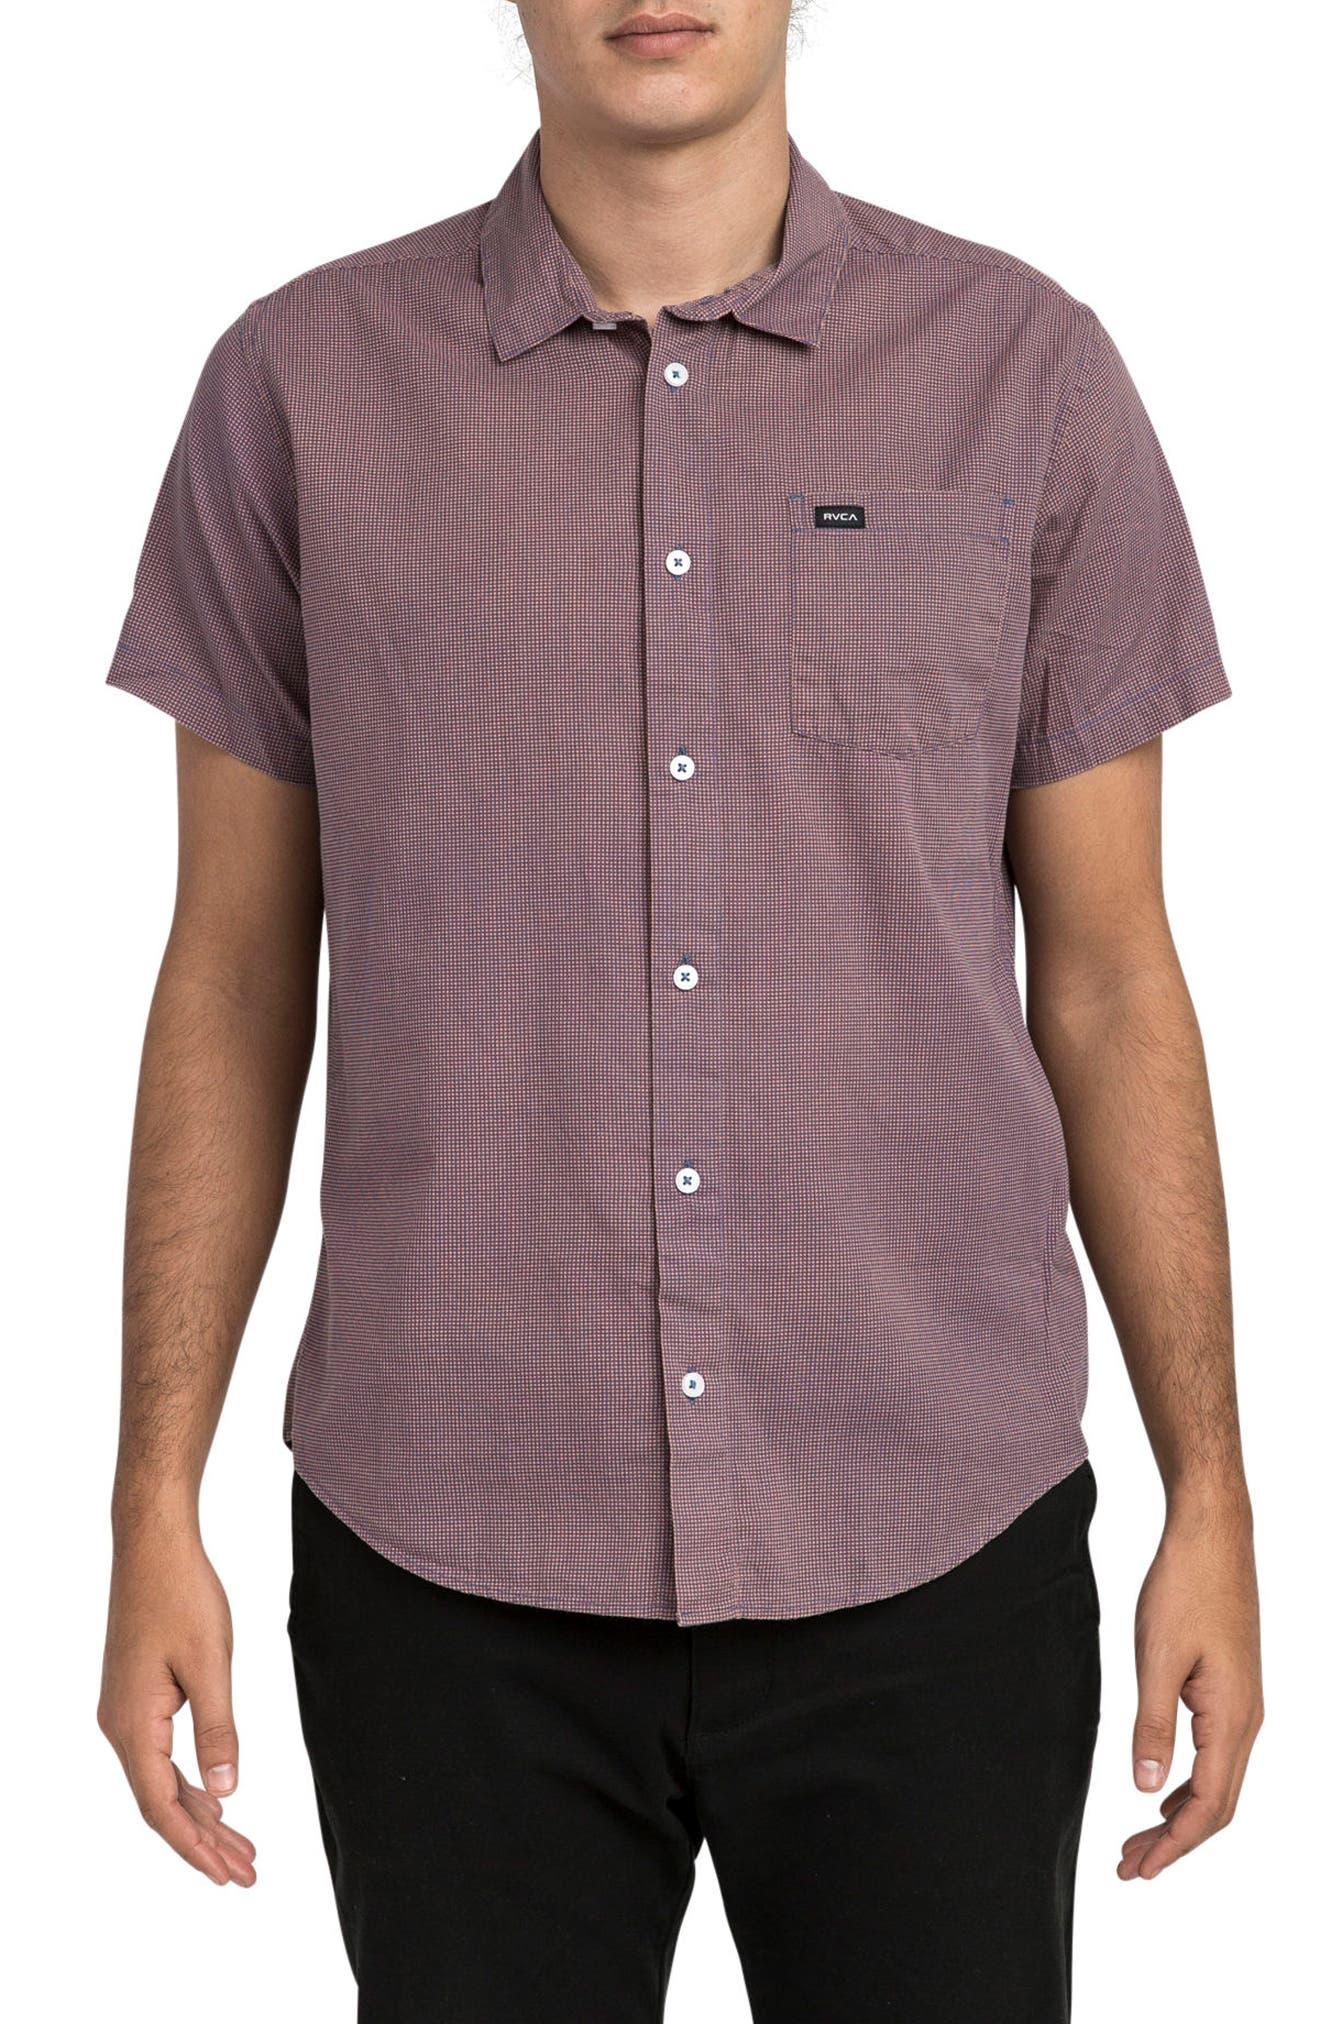 No Name Woven Shirt,                         Main,                         color, Terracotta